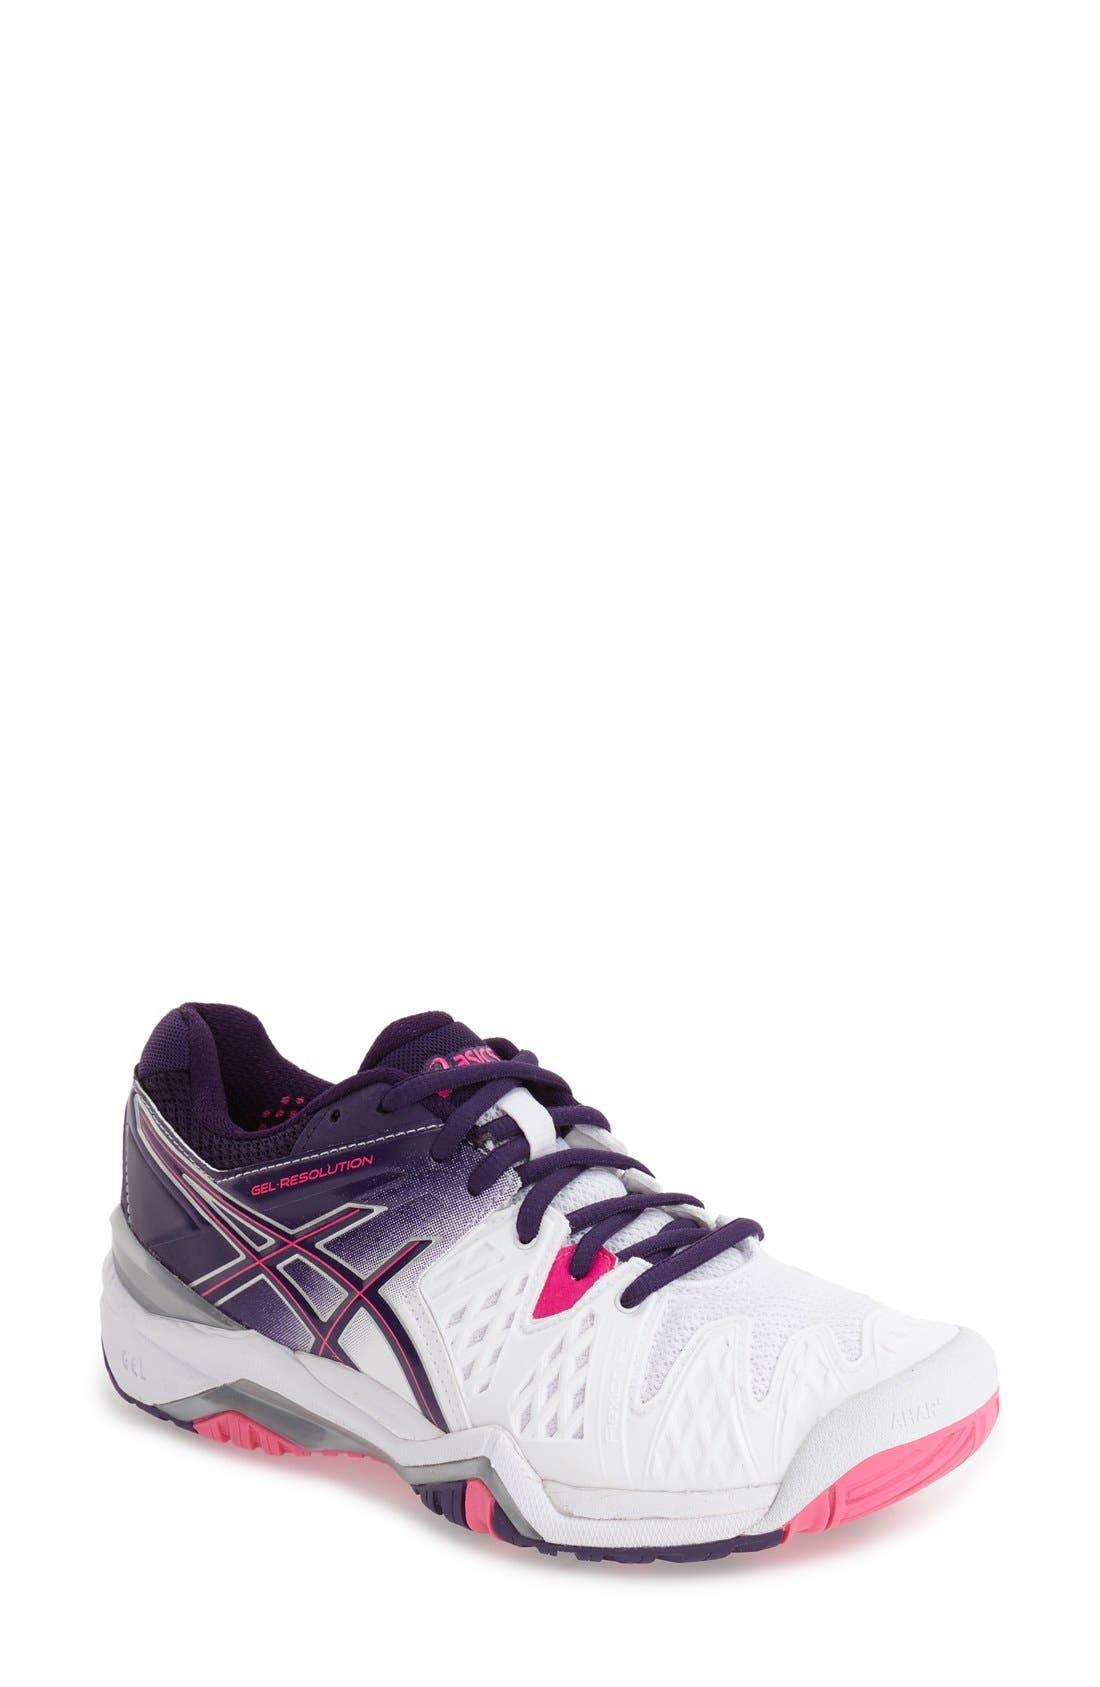 Main Image - ASICS® 'GEL-Resolution 5' Tennis Shoe (Women)